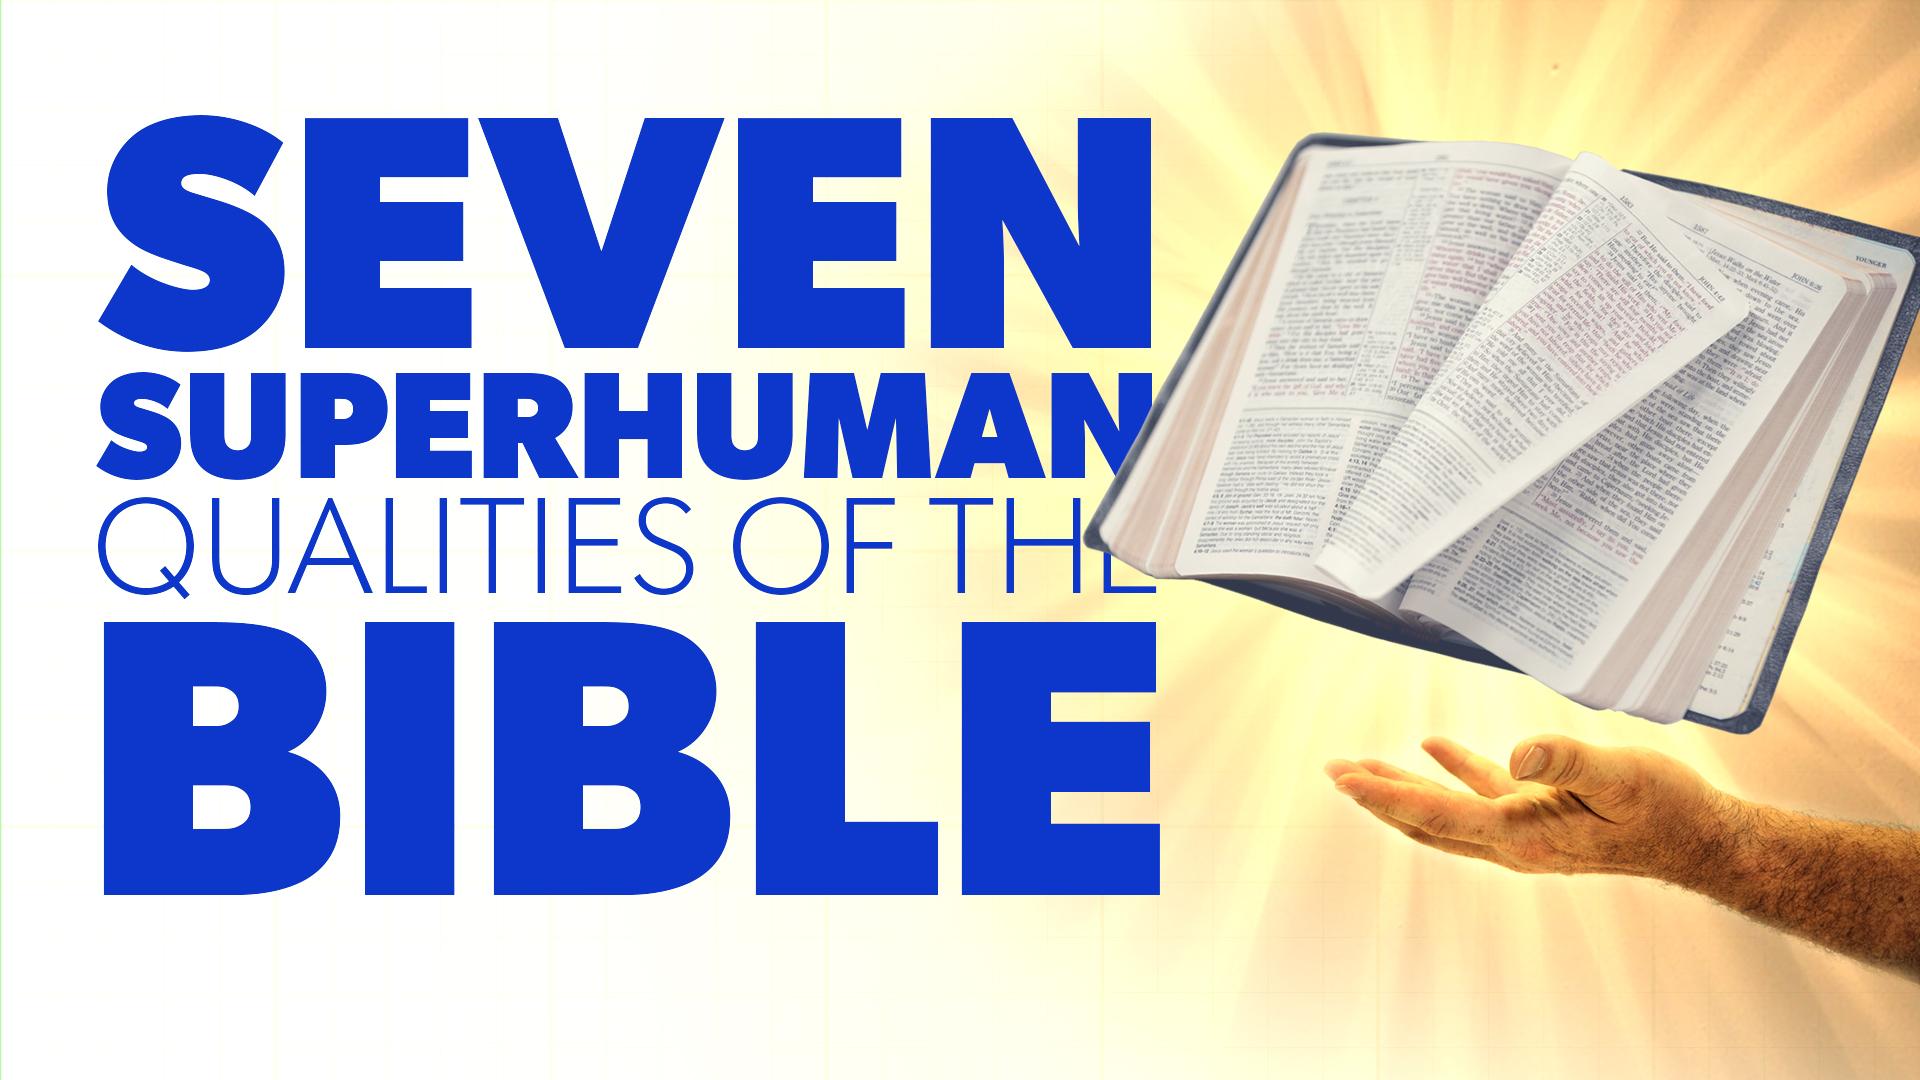 Seven Superhuman Qualities of the Bible